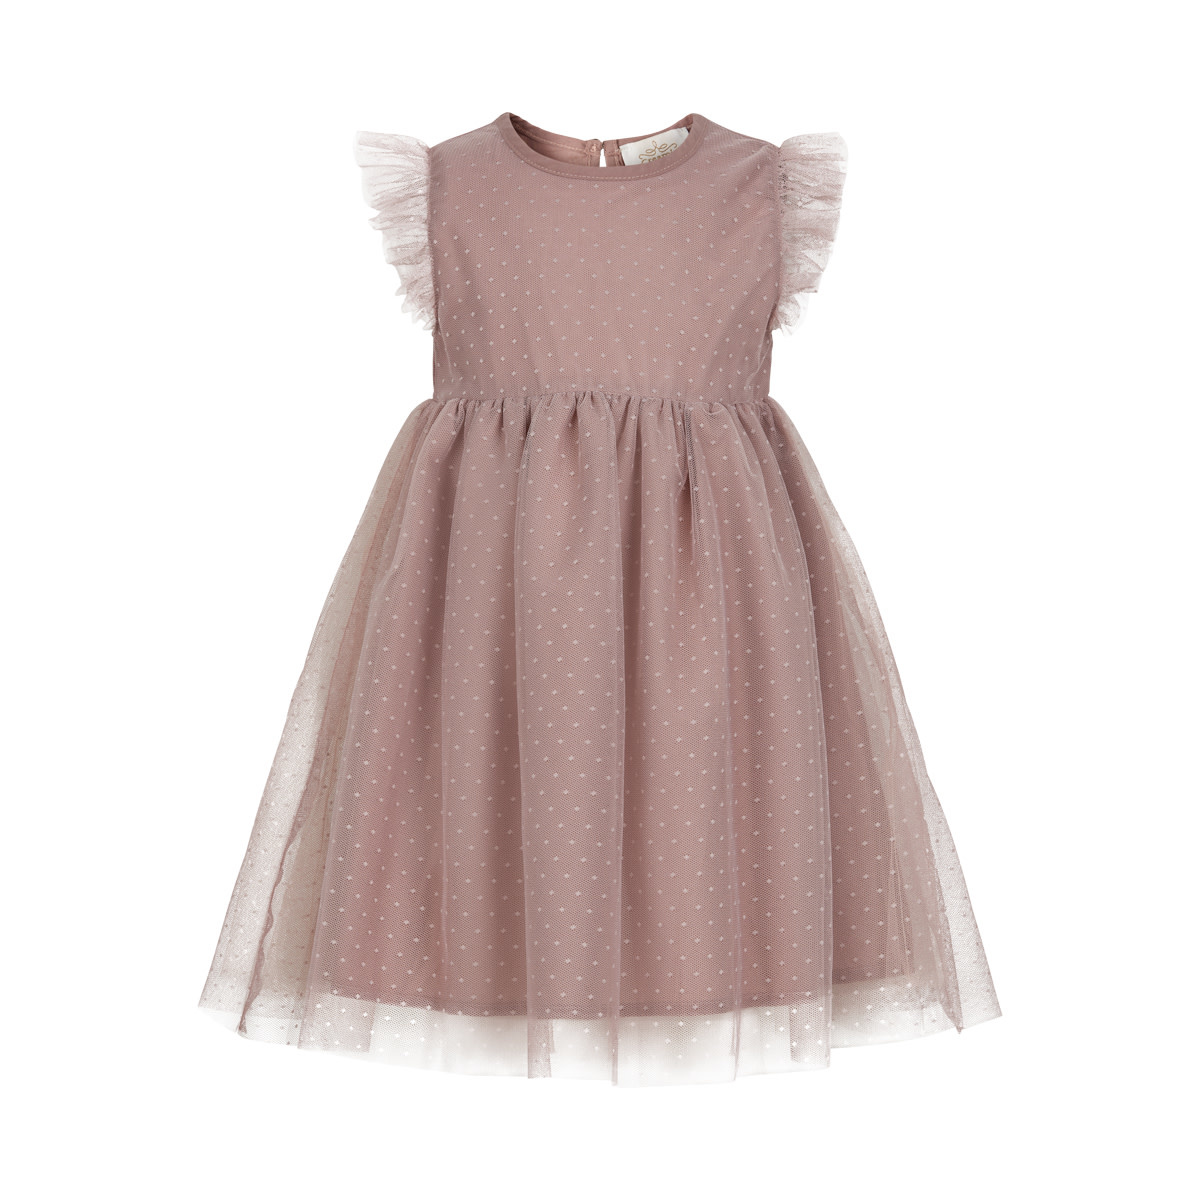 Ruffle Mesh Dress - Adobe Rose